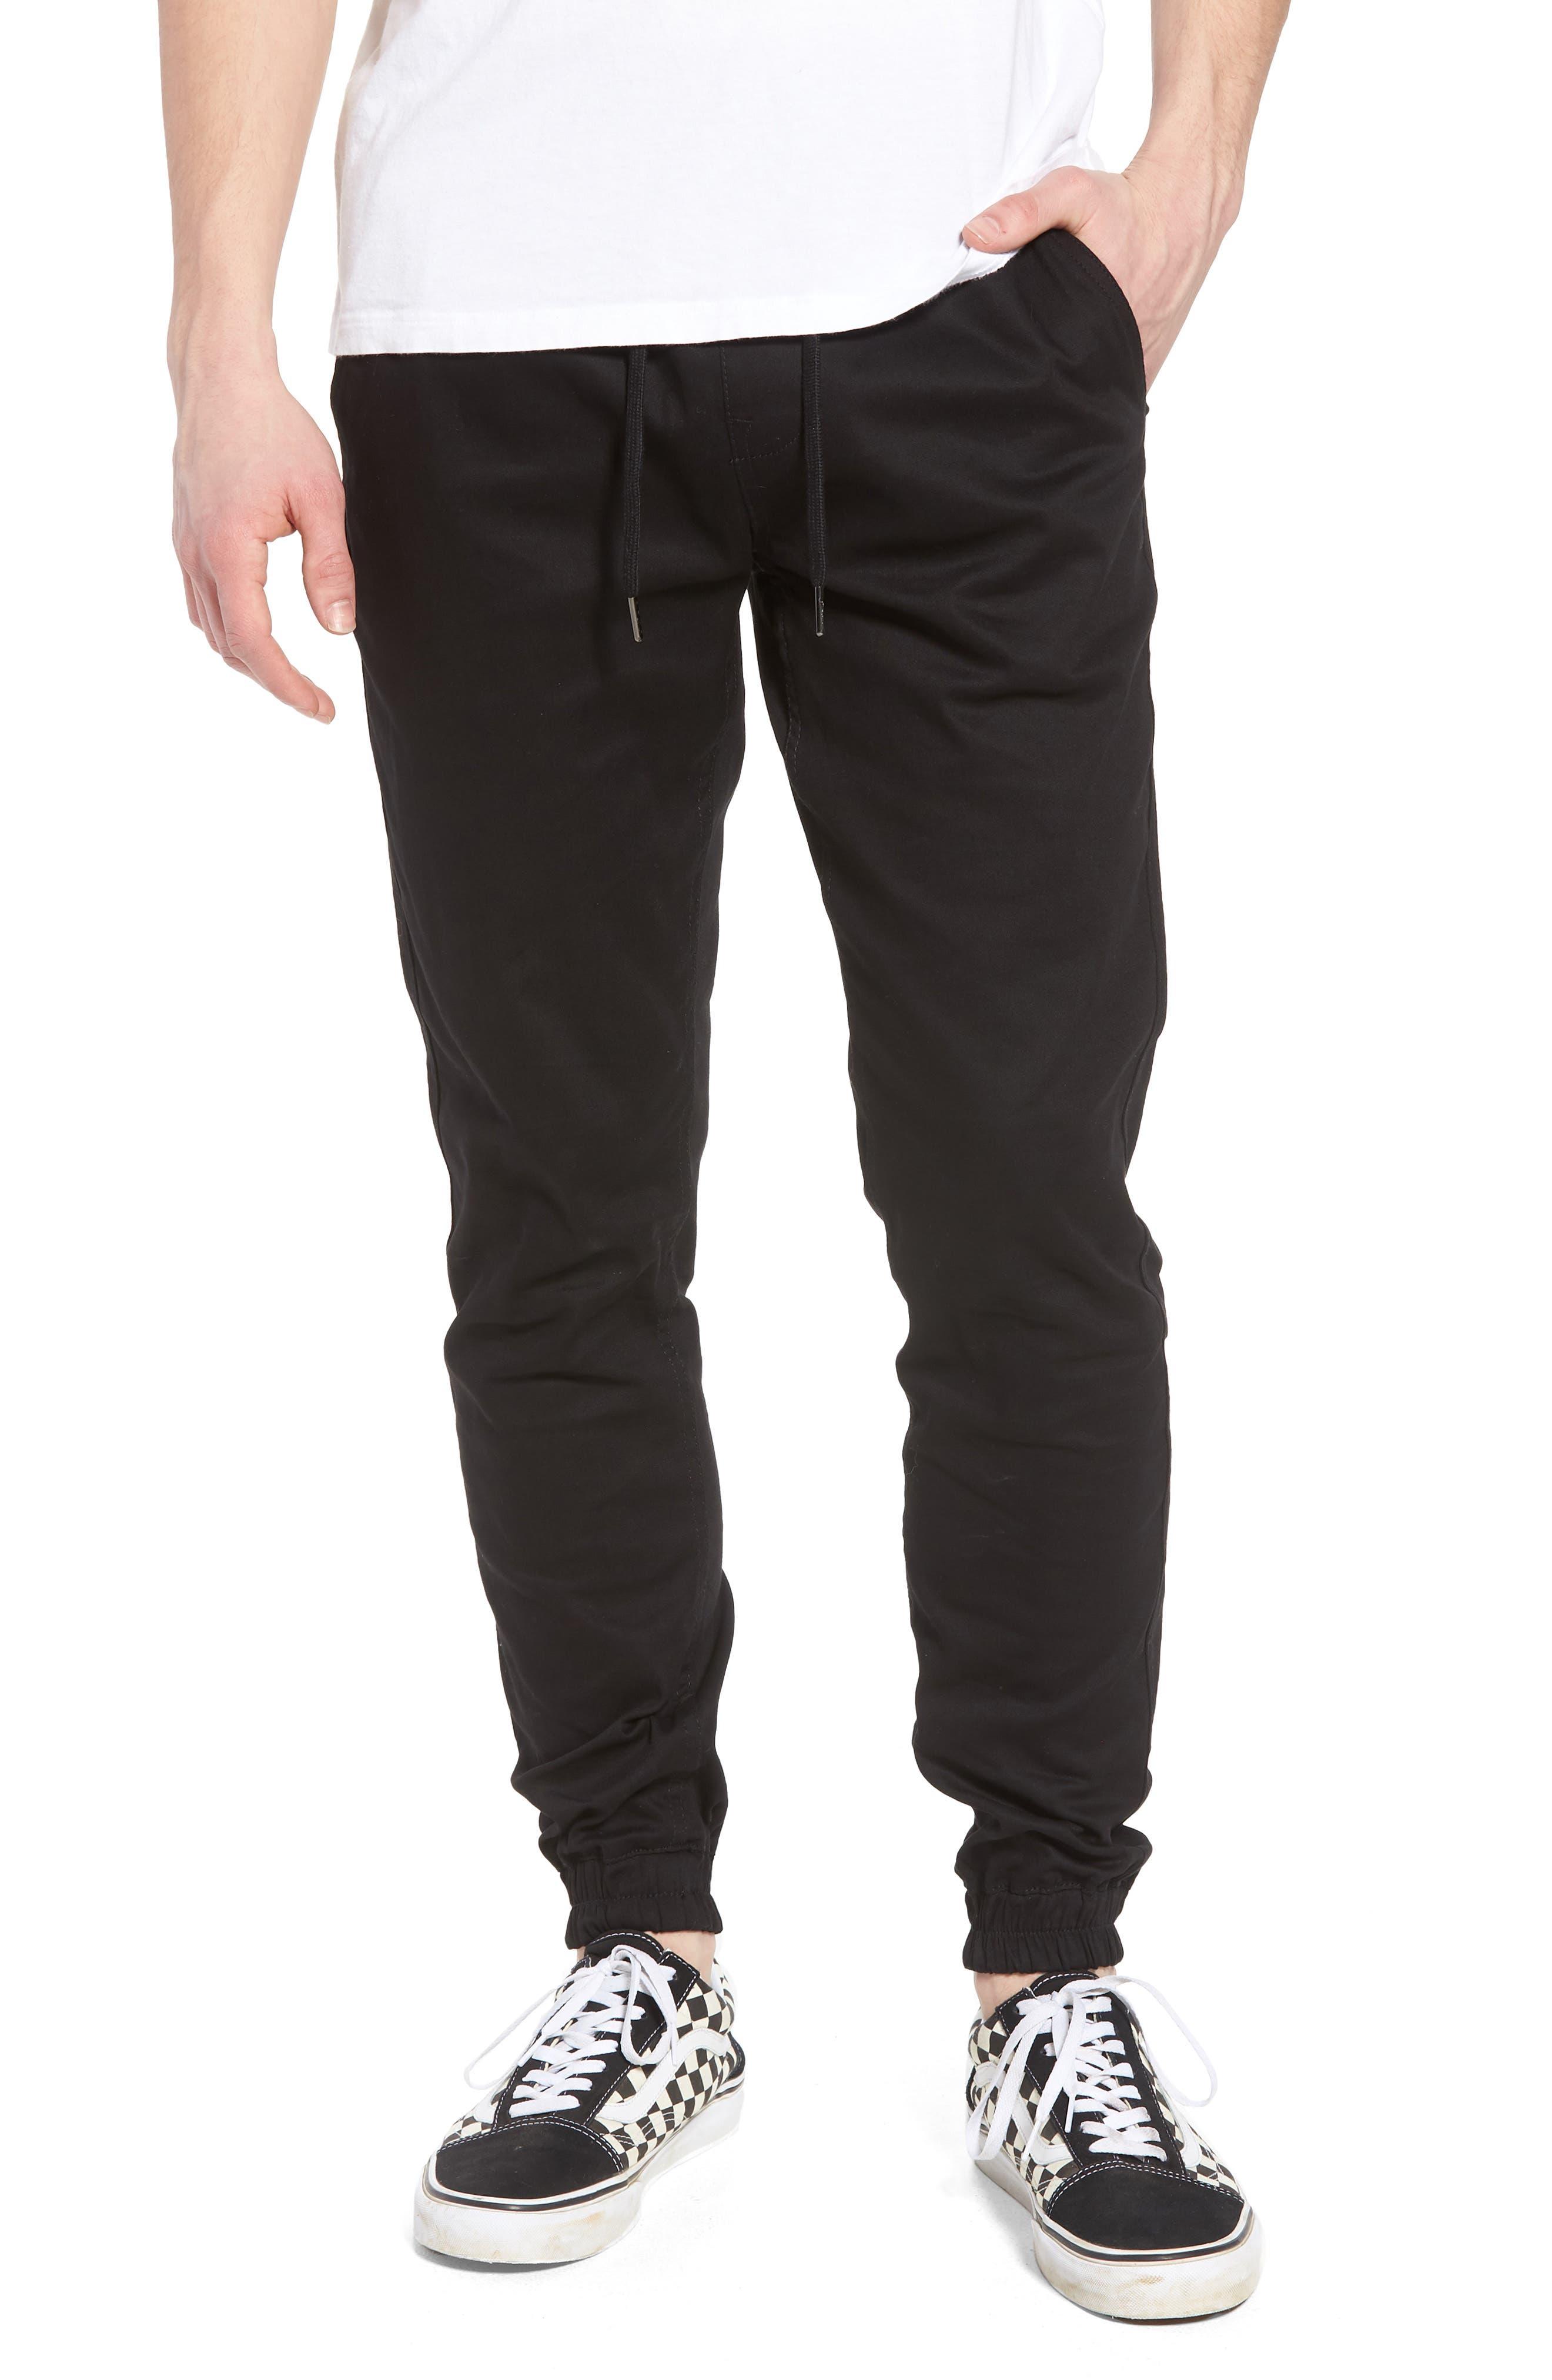 Runner Slim Fit Jogger Pants,                             Main thumbnail 1, color,                             Black